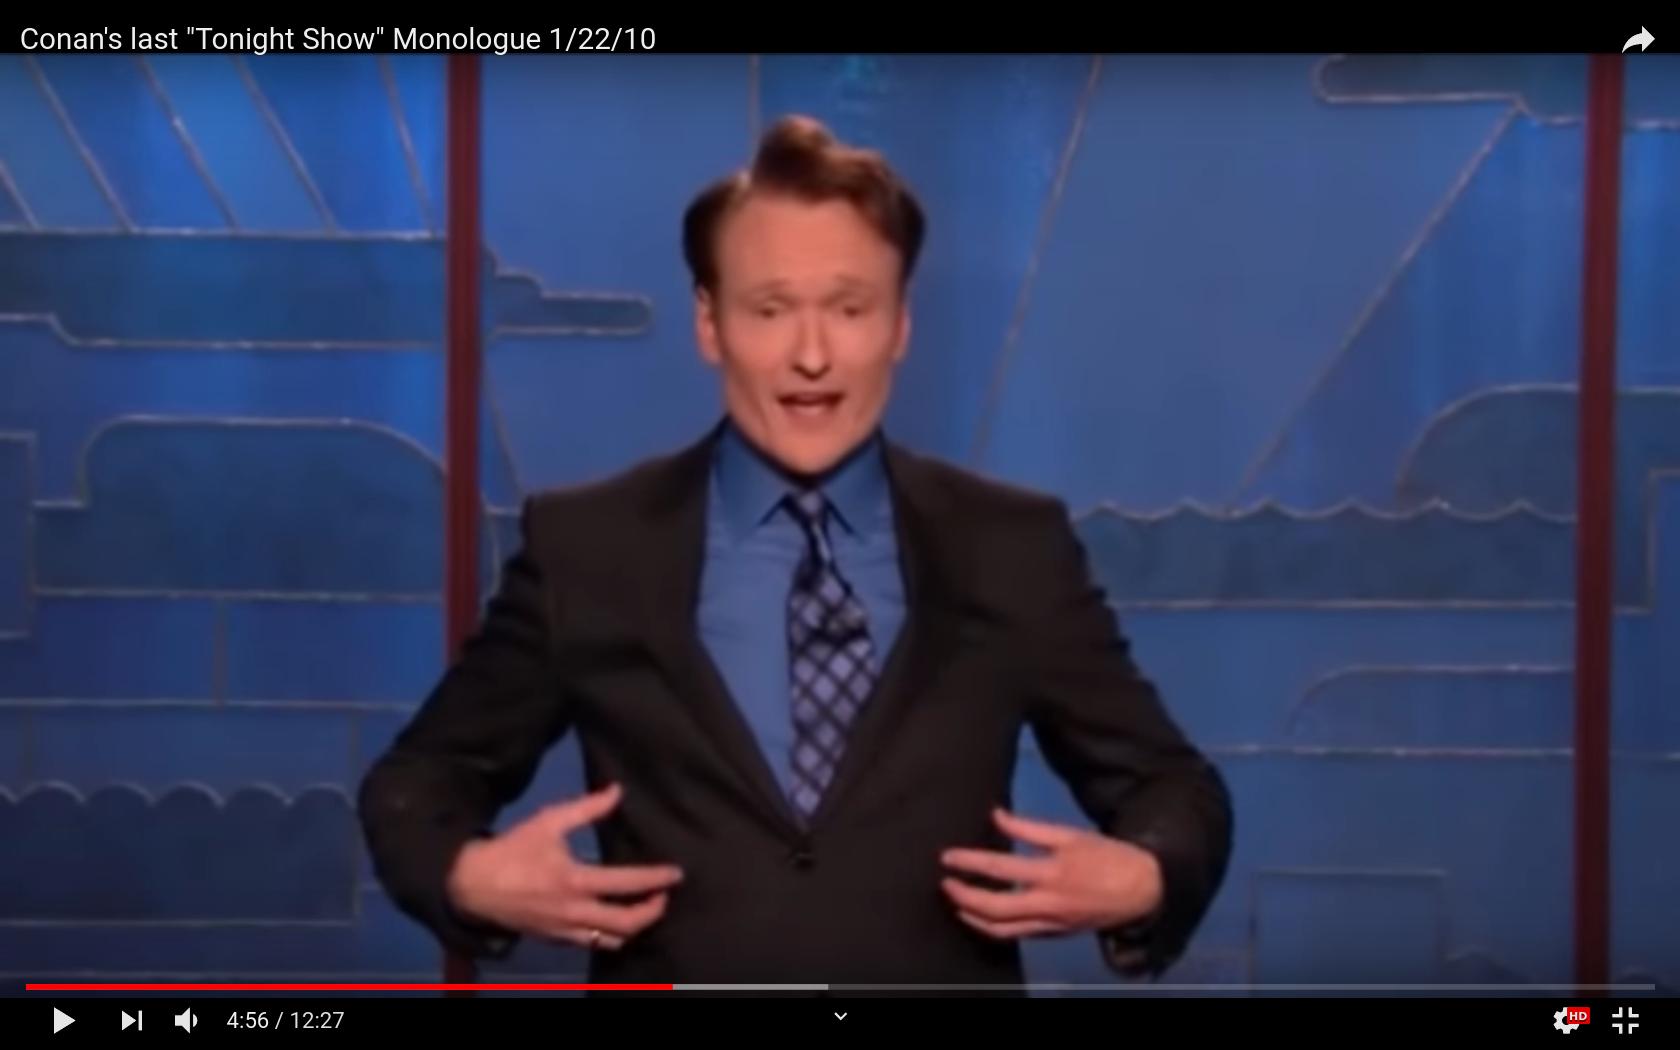 2010-01-22 - Friday - Conan Last Show on NBC Tonight Show Screenshot at 2020-03-23 23:48:44.png